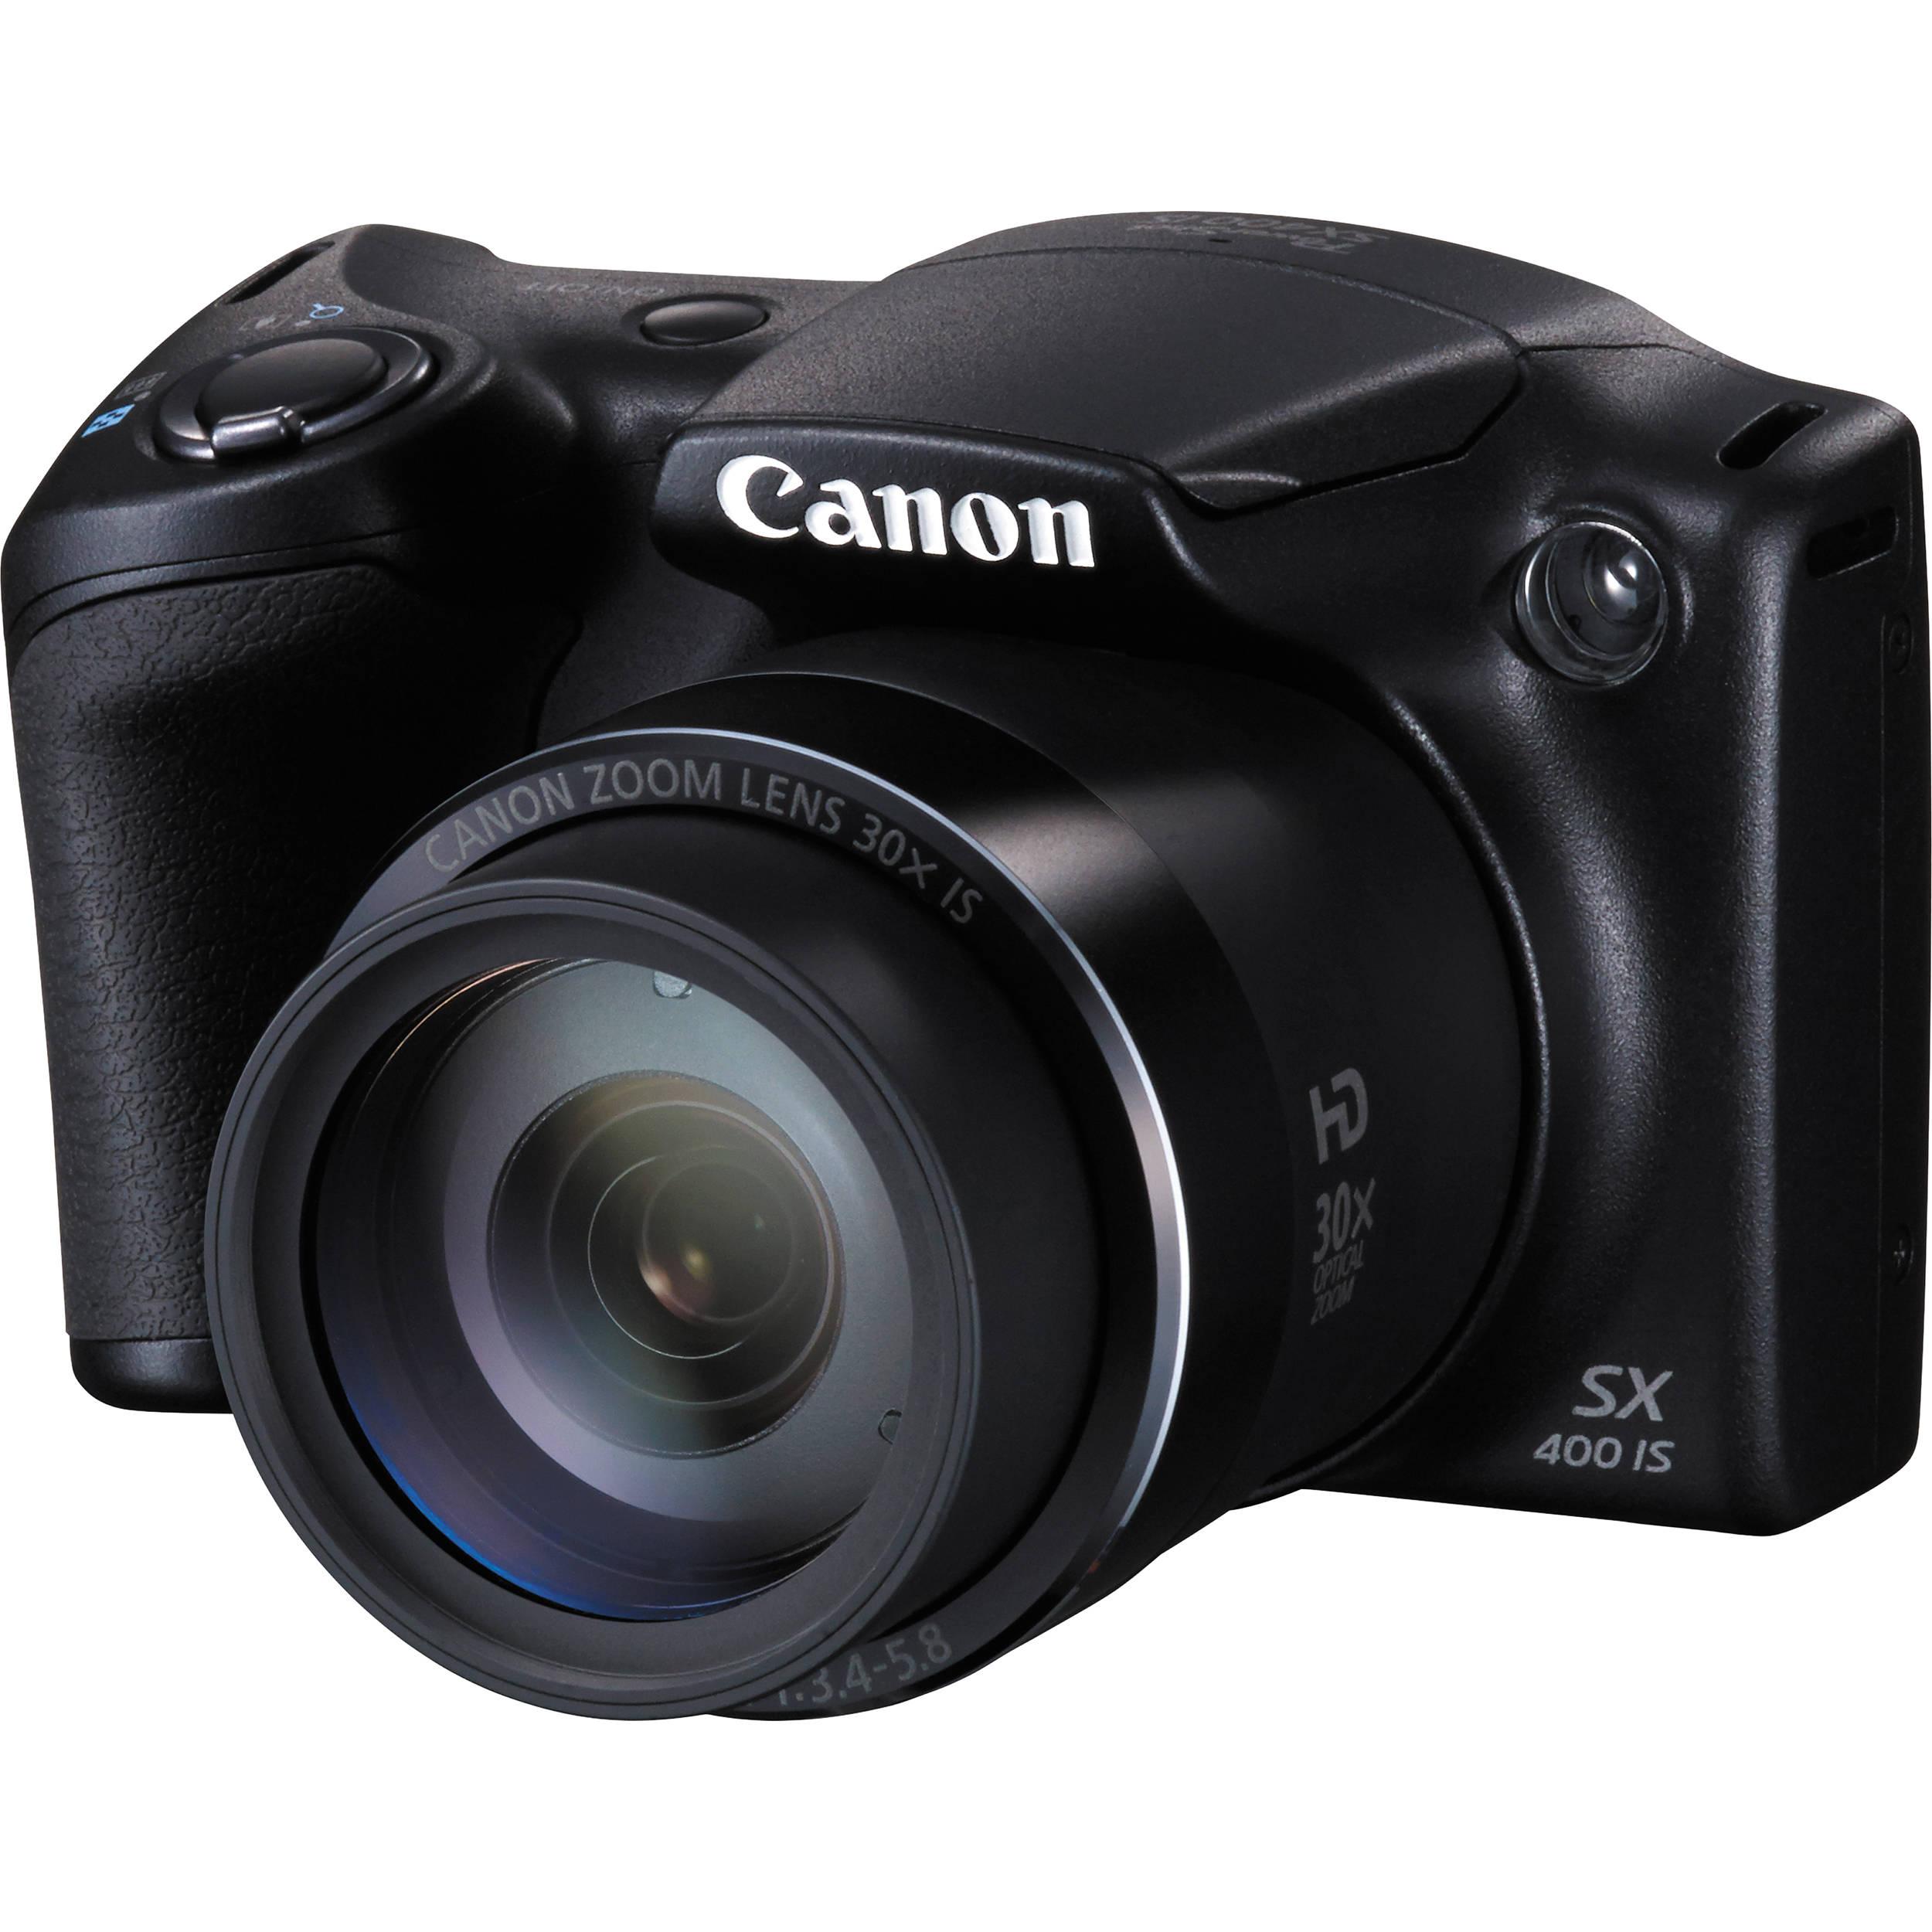 Canon PowerShot SX400 IS Digital Camera (Black) 9545B001 B&H